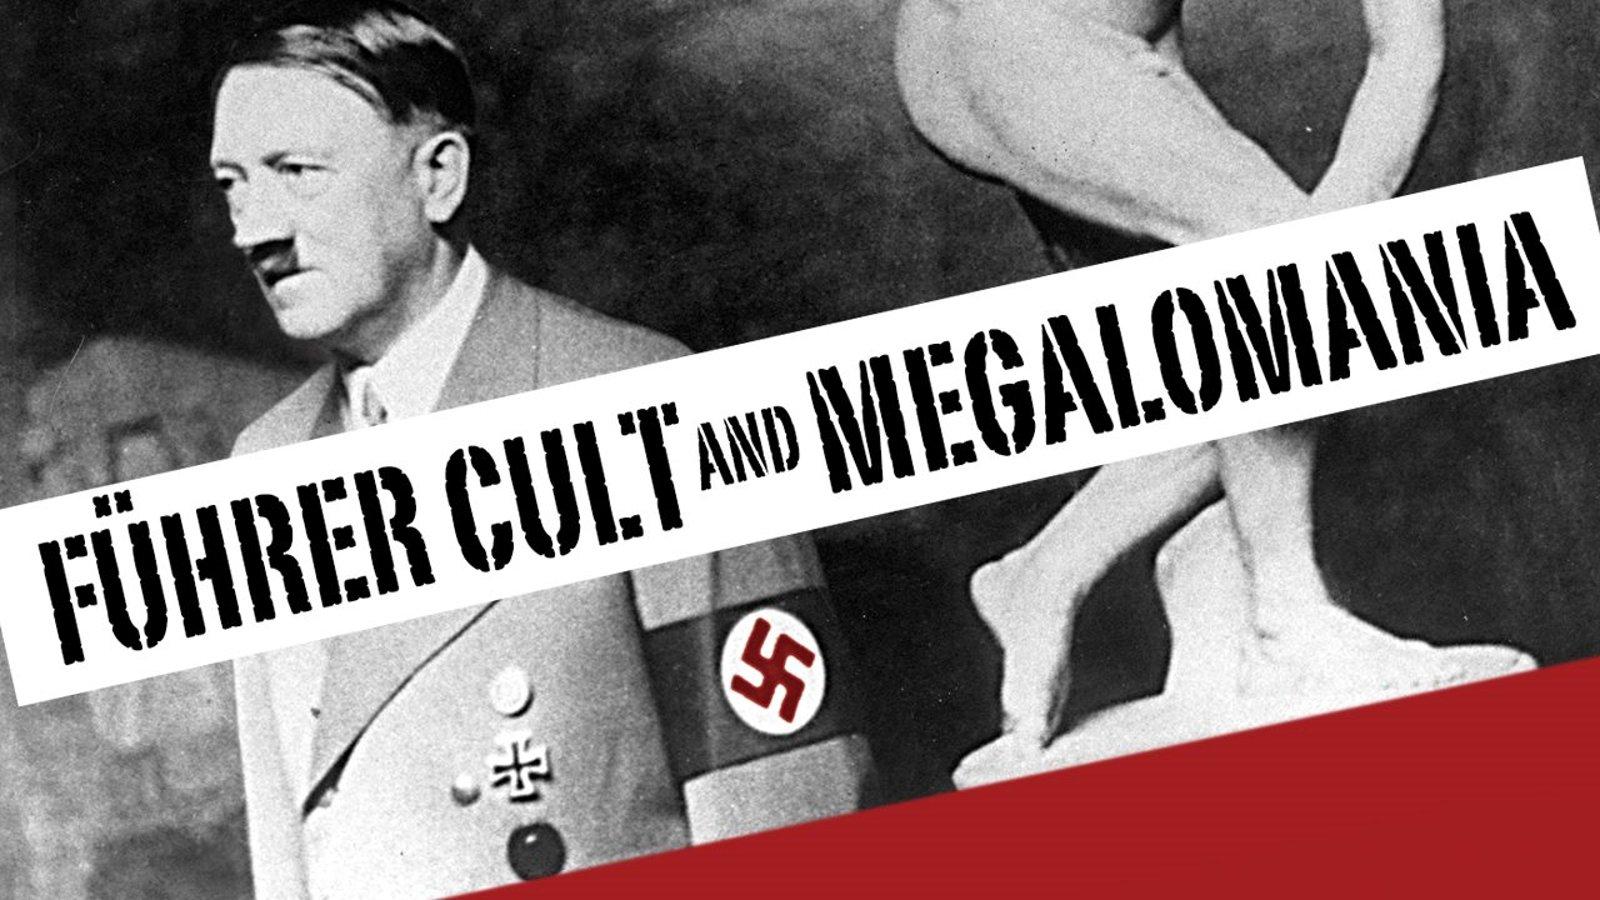 Fuhrer Cult and Megalomania